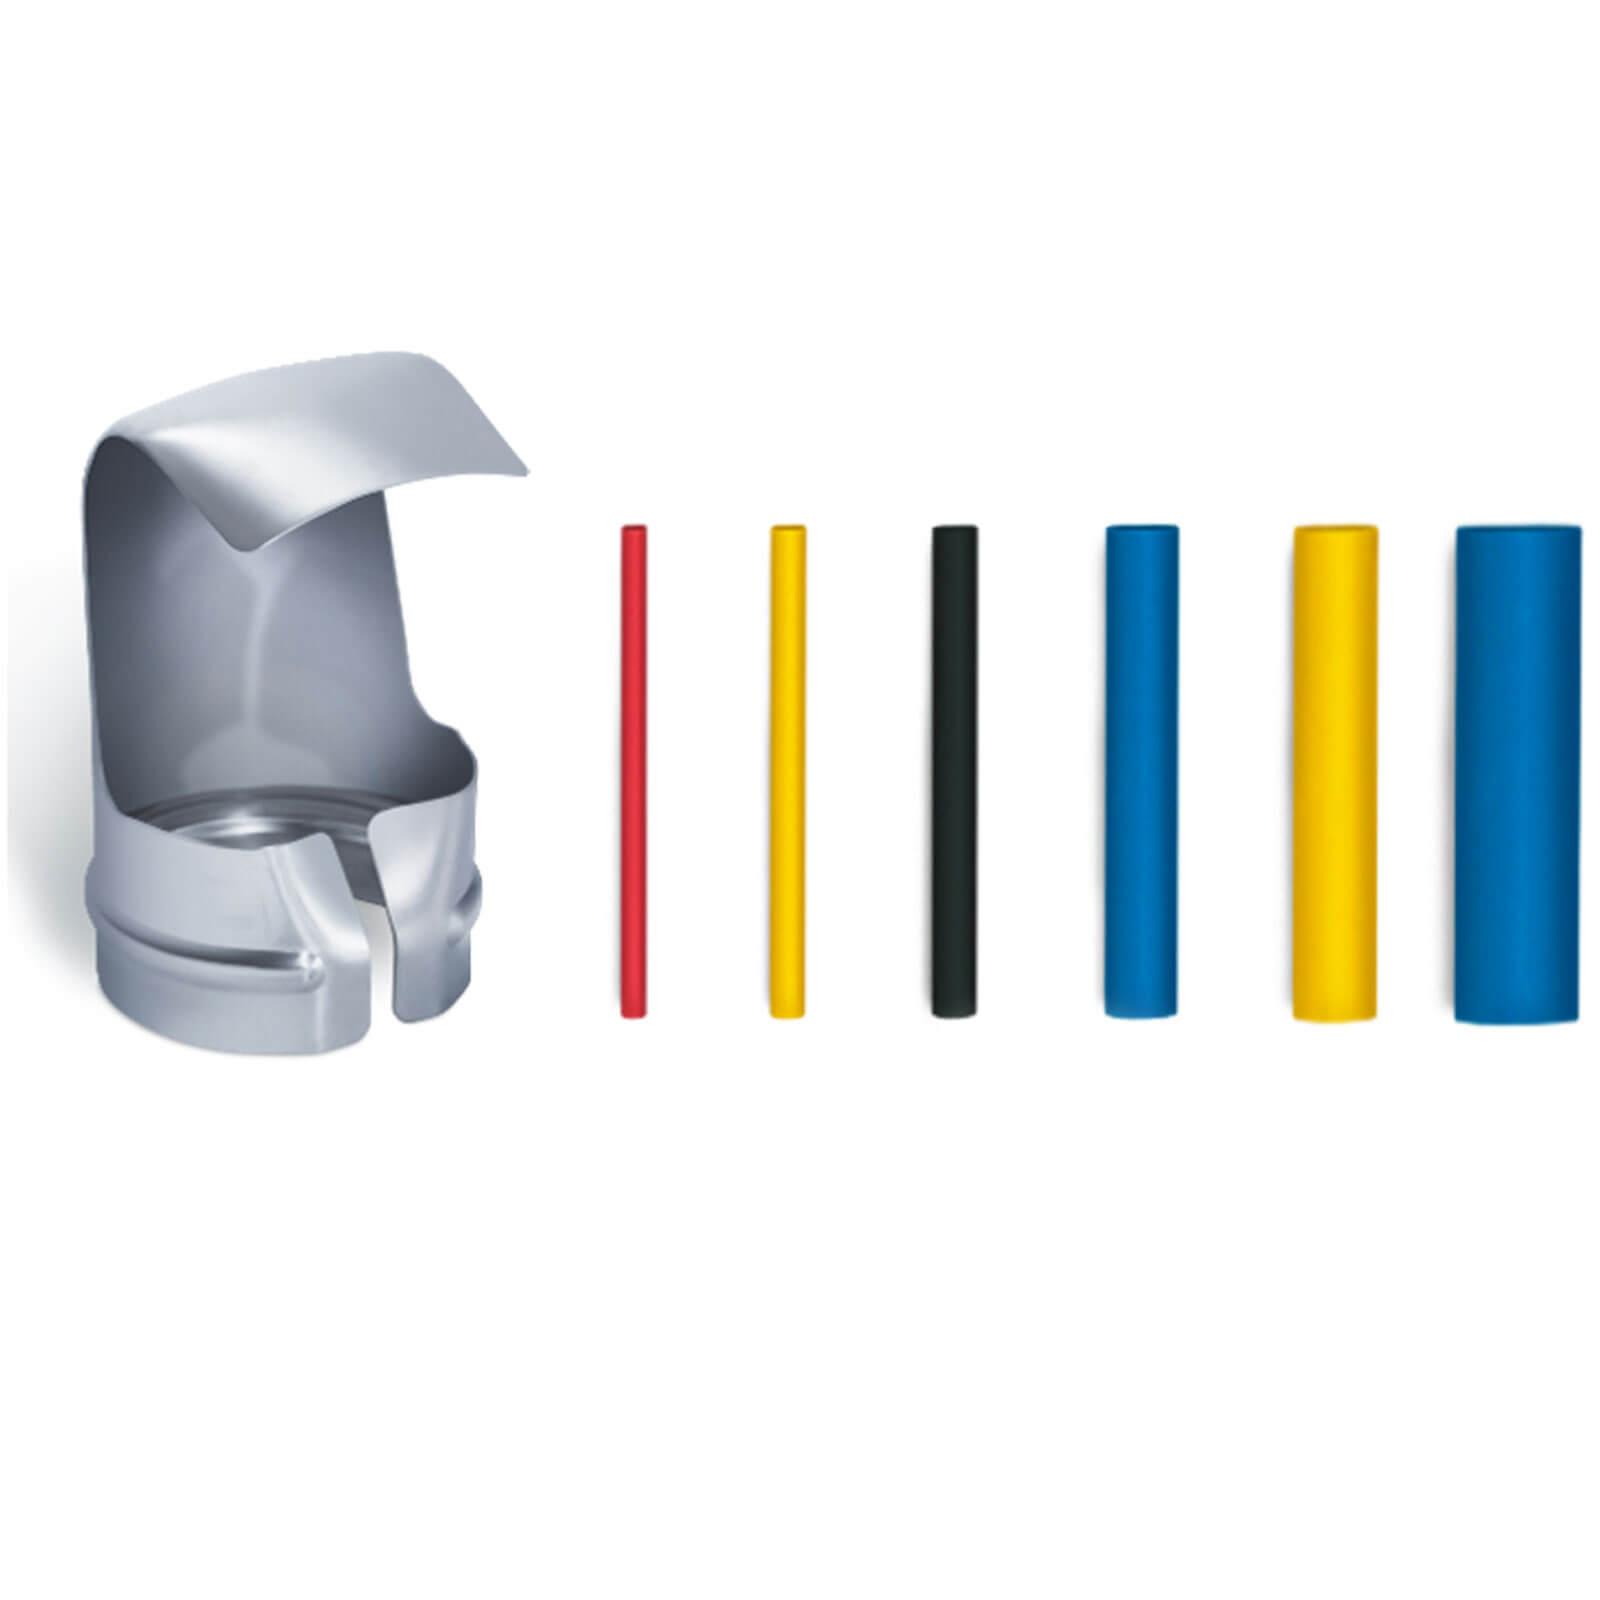 Image of Steinel 101 Piece Heat Shrink Tubing & Nozzle Set